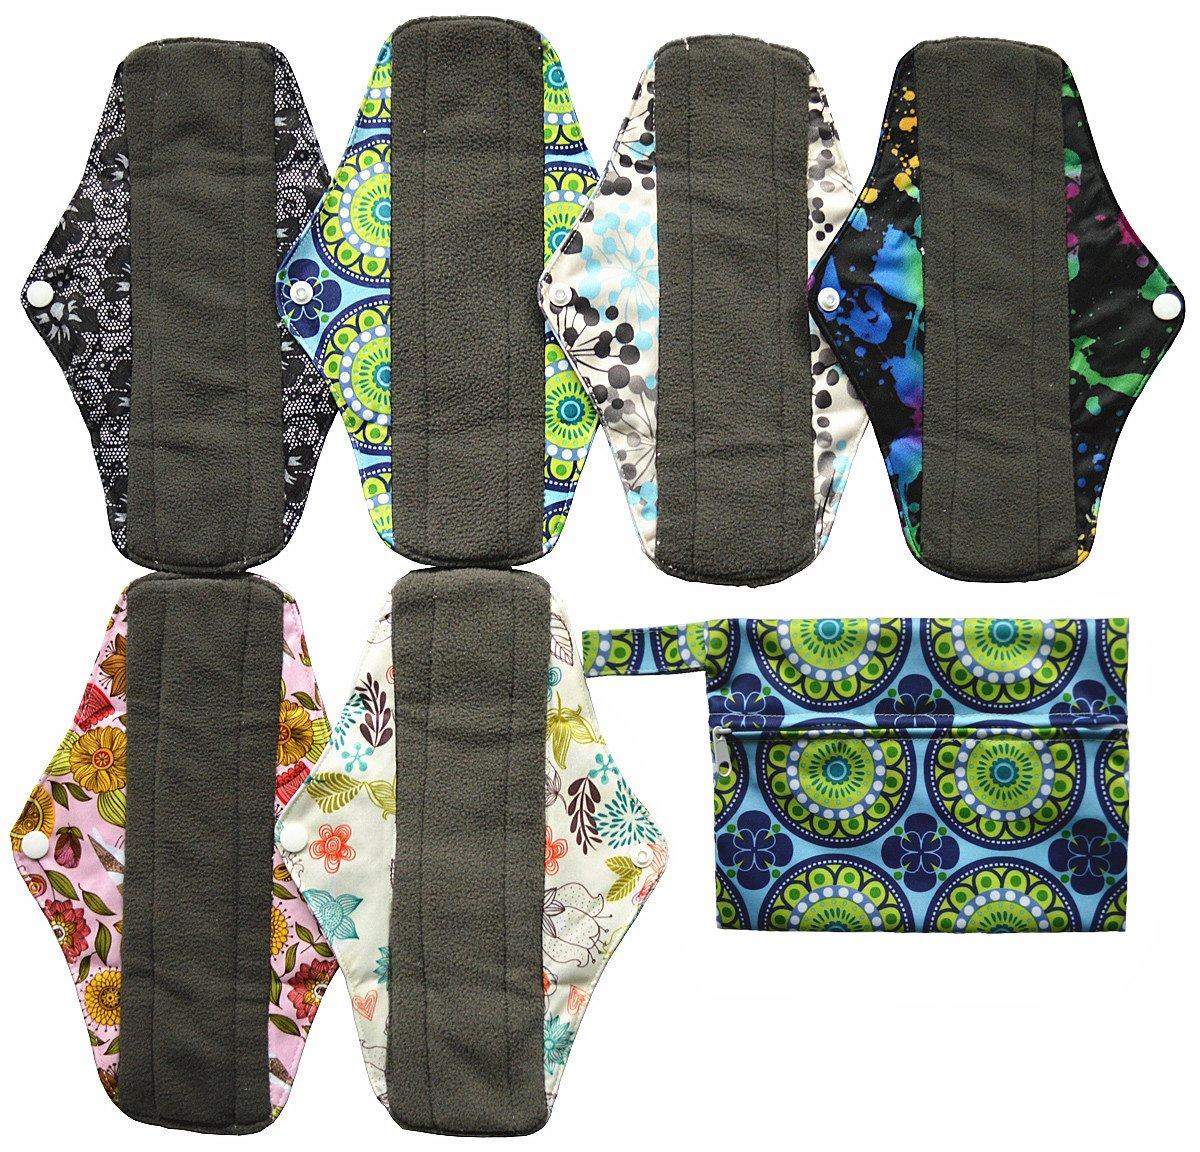 7pcs Set 1pc Mini Wet Bag +6pcs 10 Inch Regular Charcoal Bamboo Mama Cloth/ Menstrual Pads/ Reusable Sanitary Pads Hibaby